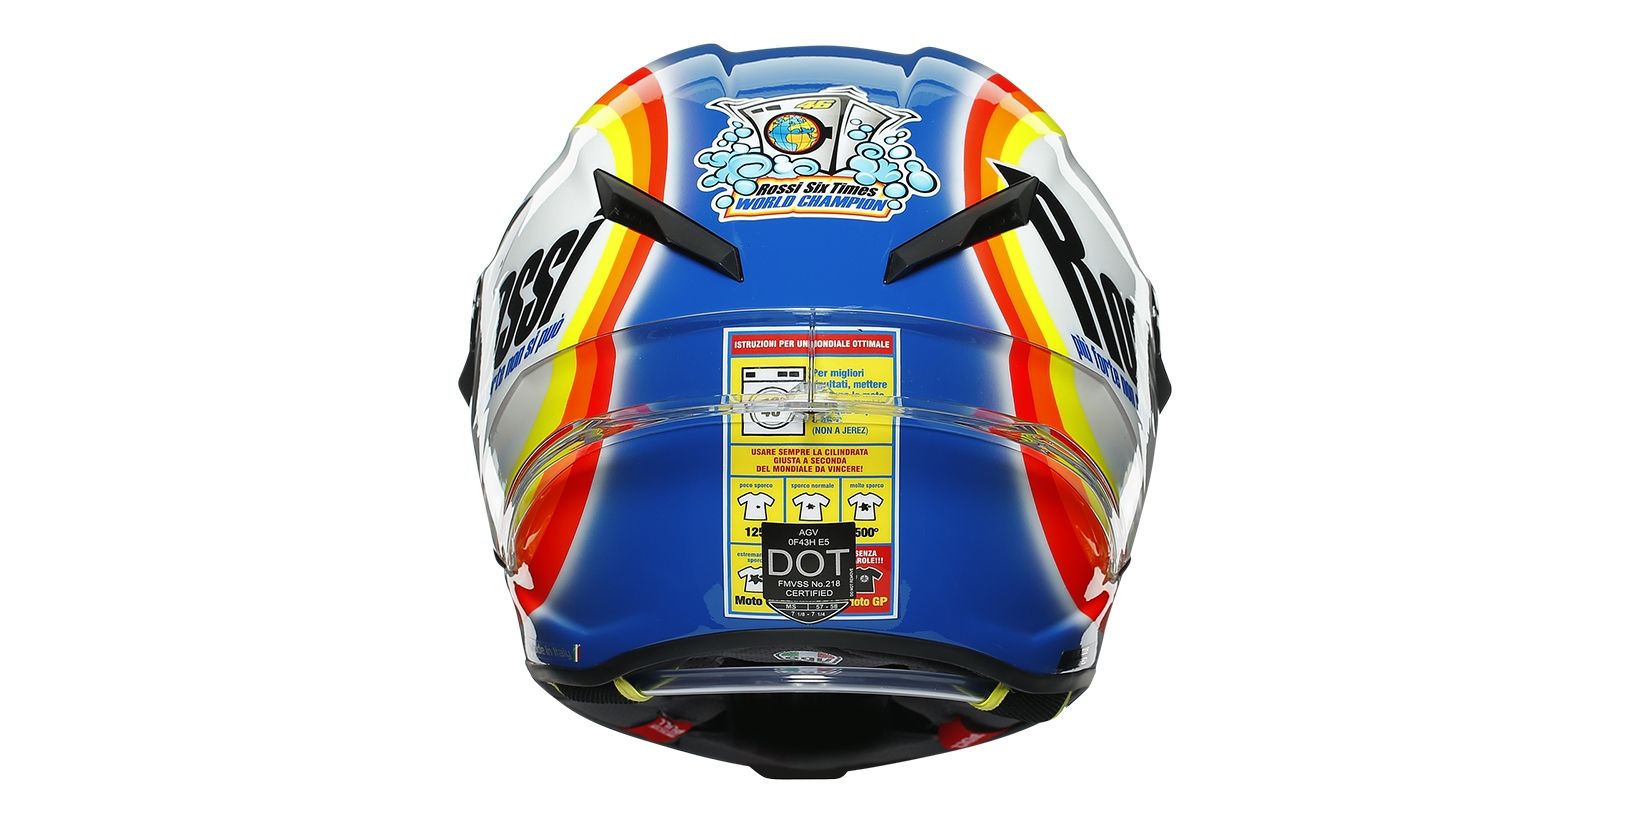 603199MF-006-6-1